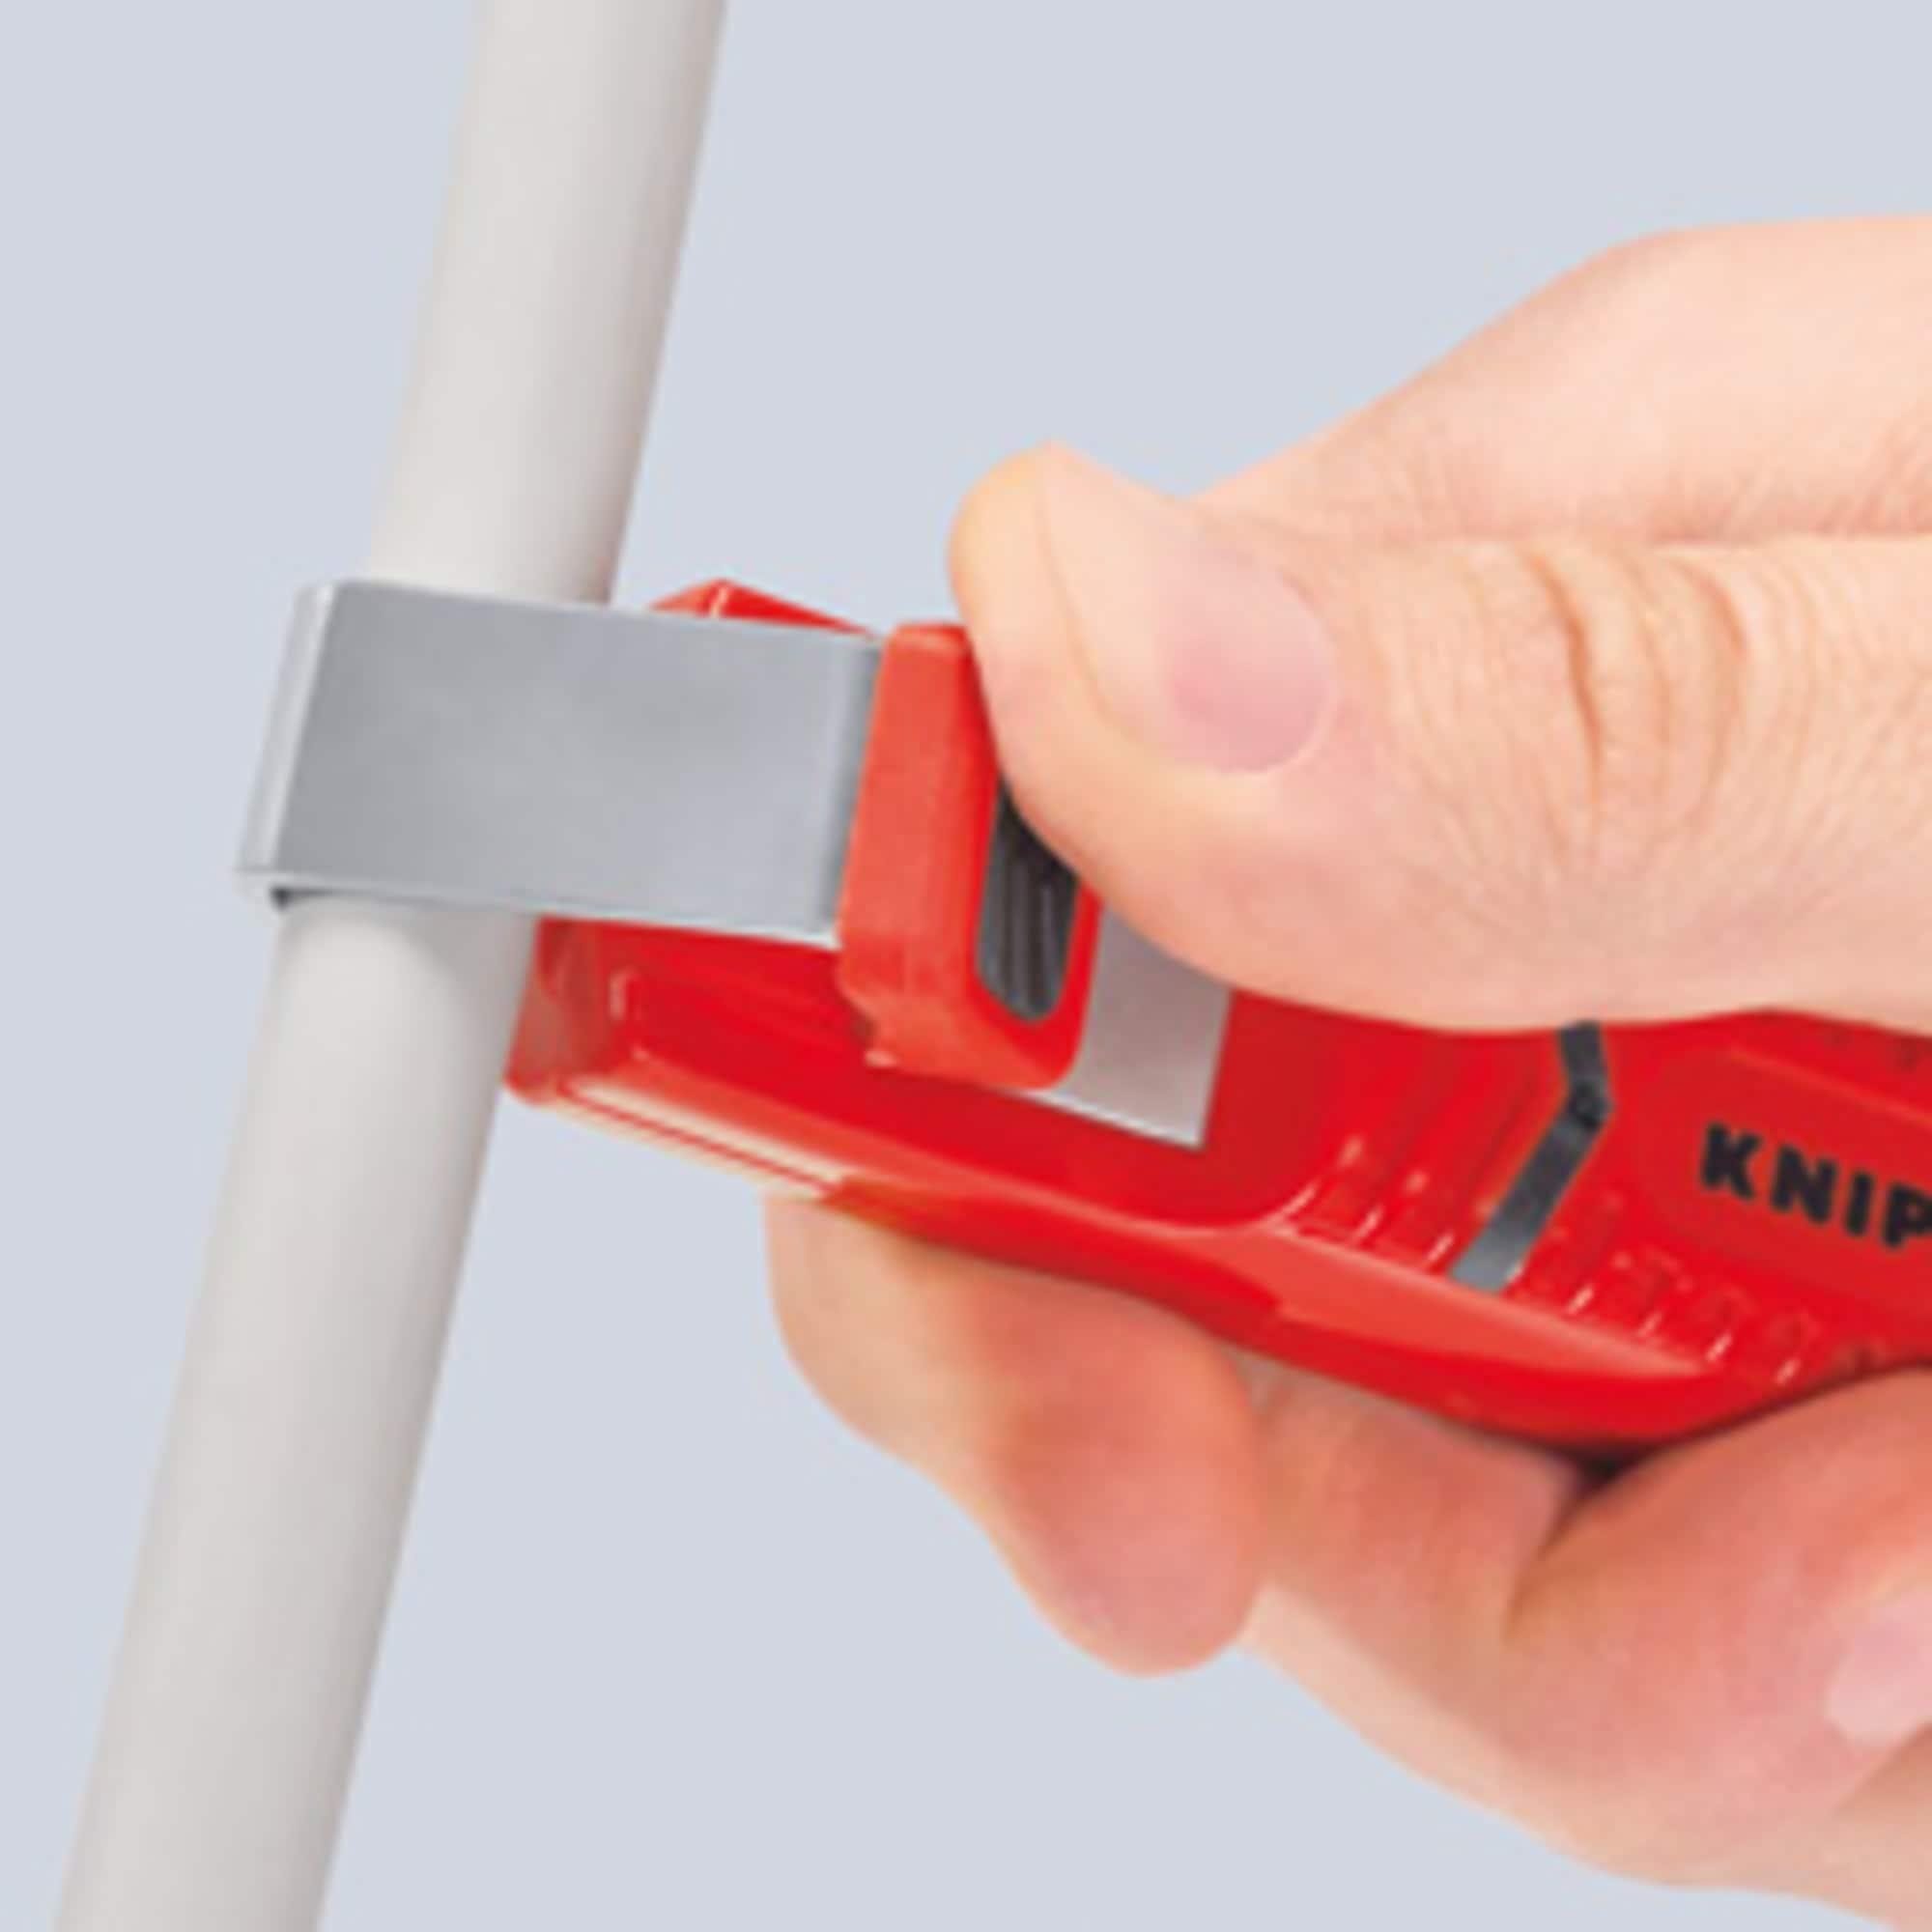 Knipex Abisolier-/ Abmantelungswerkzeug Abmantelungswerkzeug 16 20 165 SB